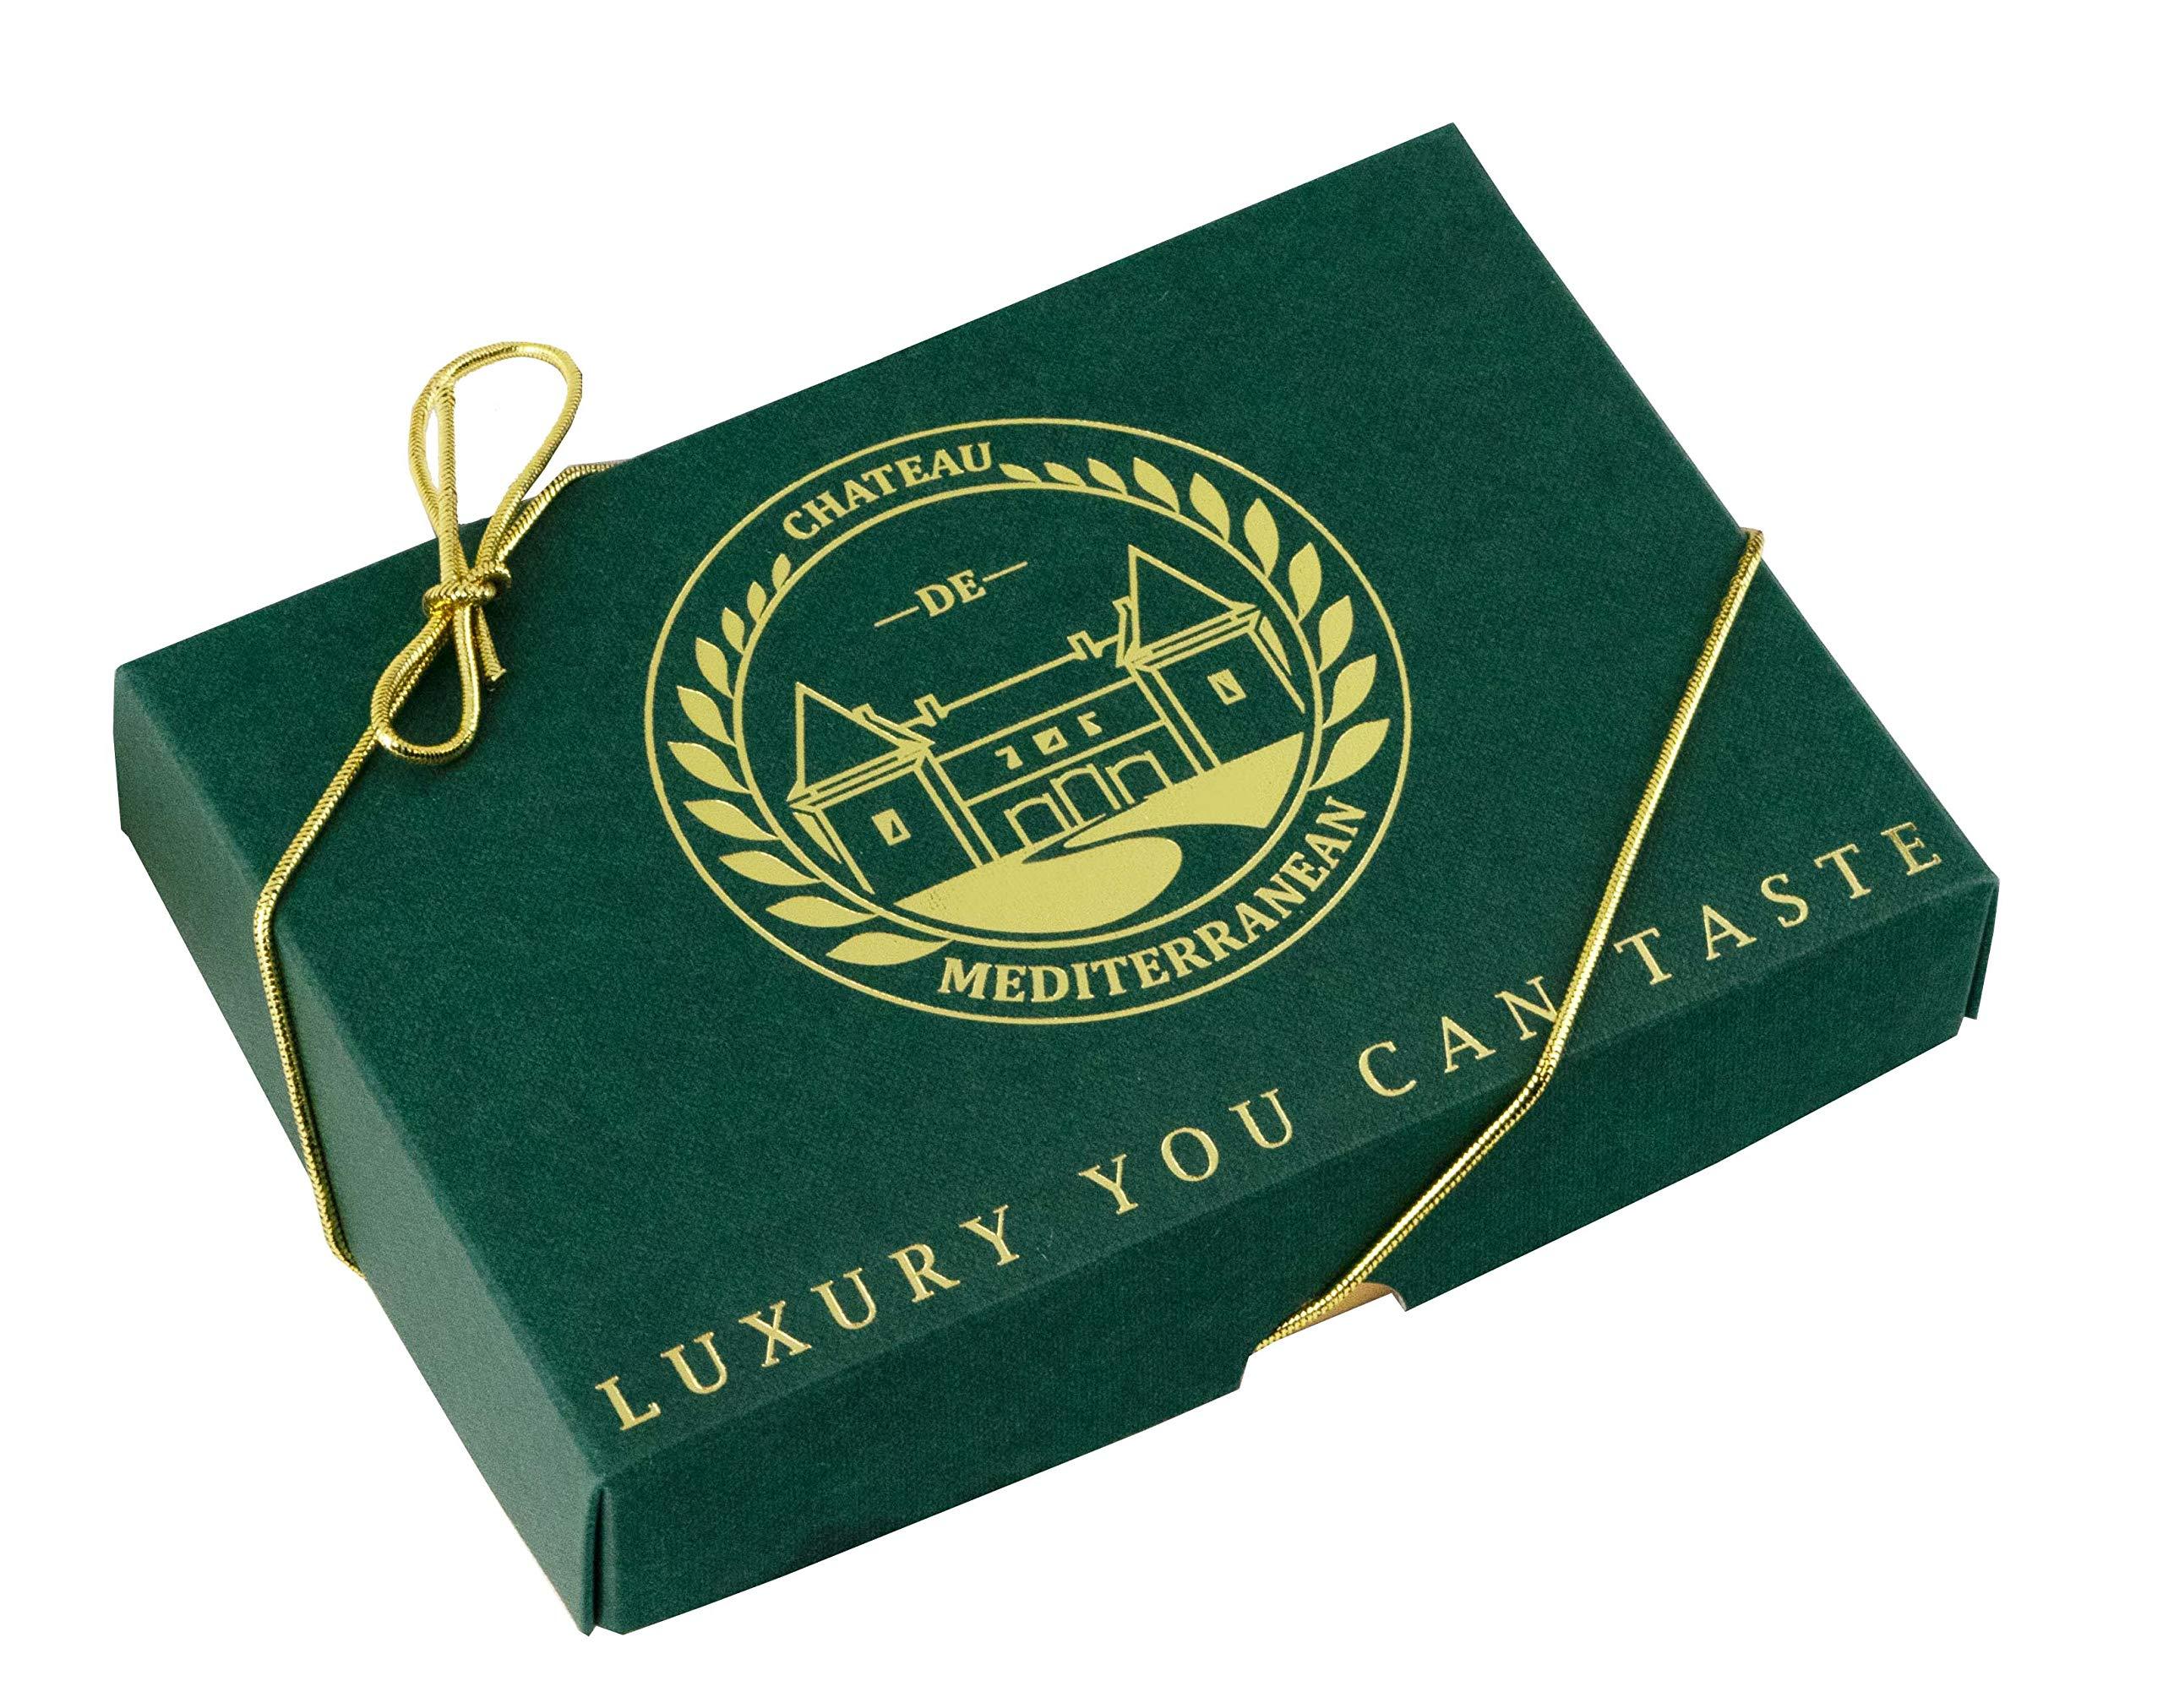 Vegan Baklava Baklawa, 24 Pieces, Chateau de Mediterranean, Gift Box with Ribbon 4